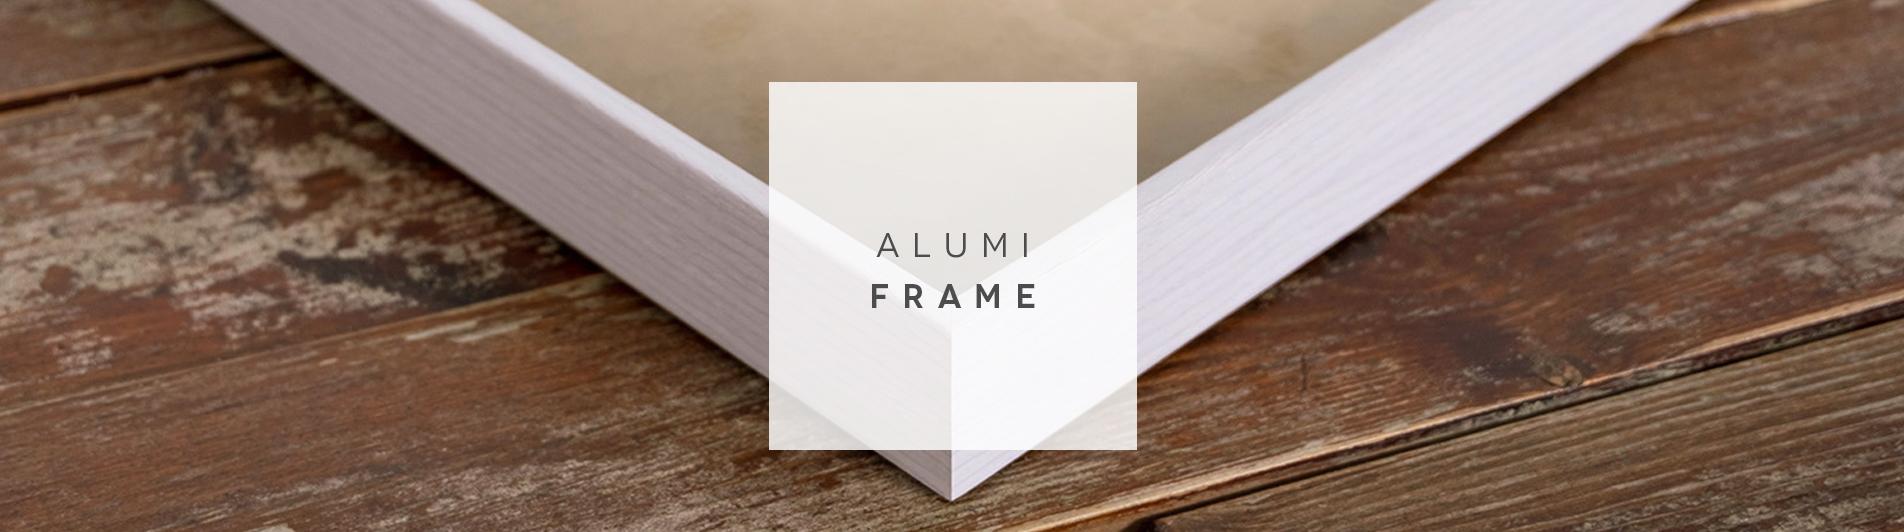 Alumi Frame